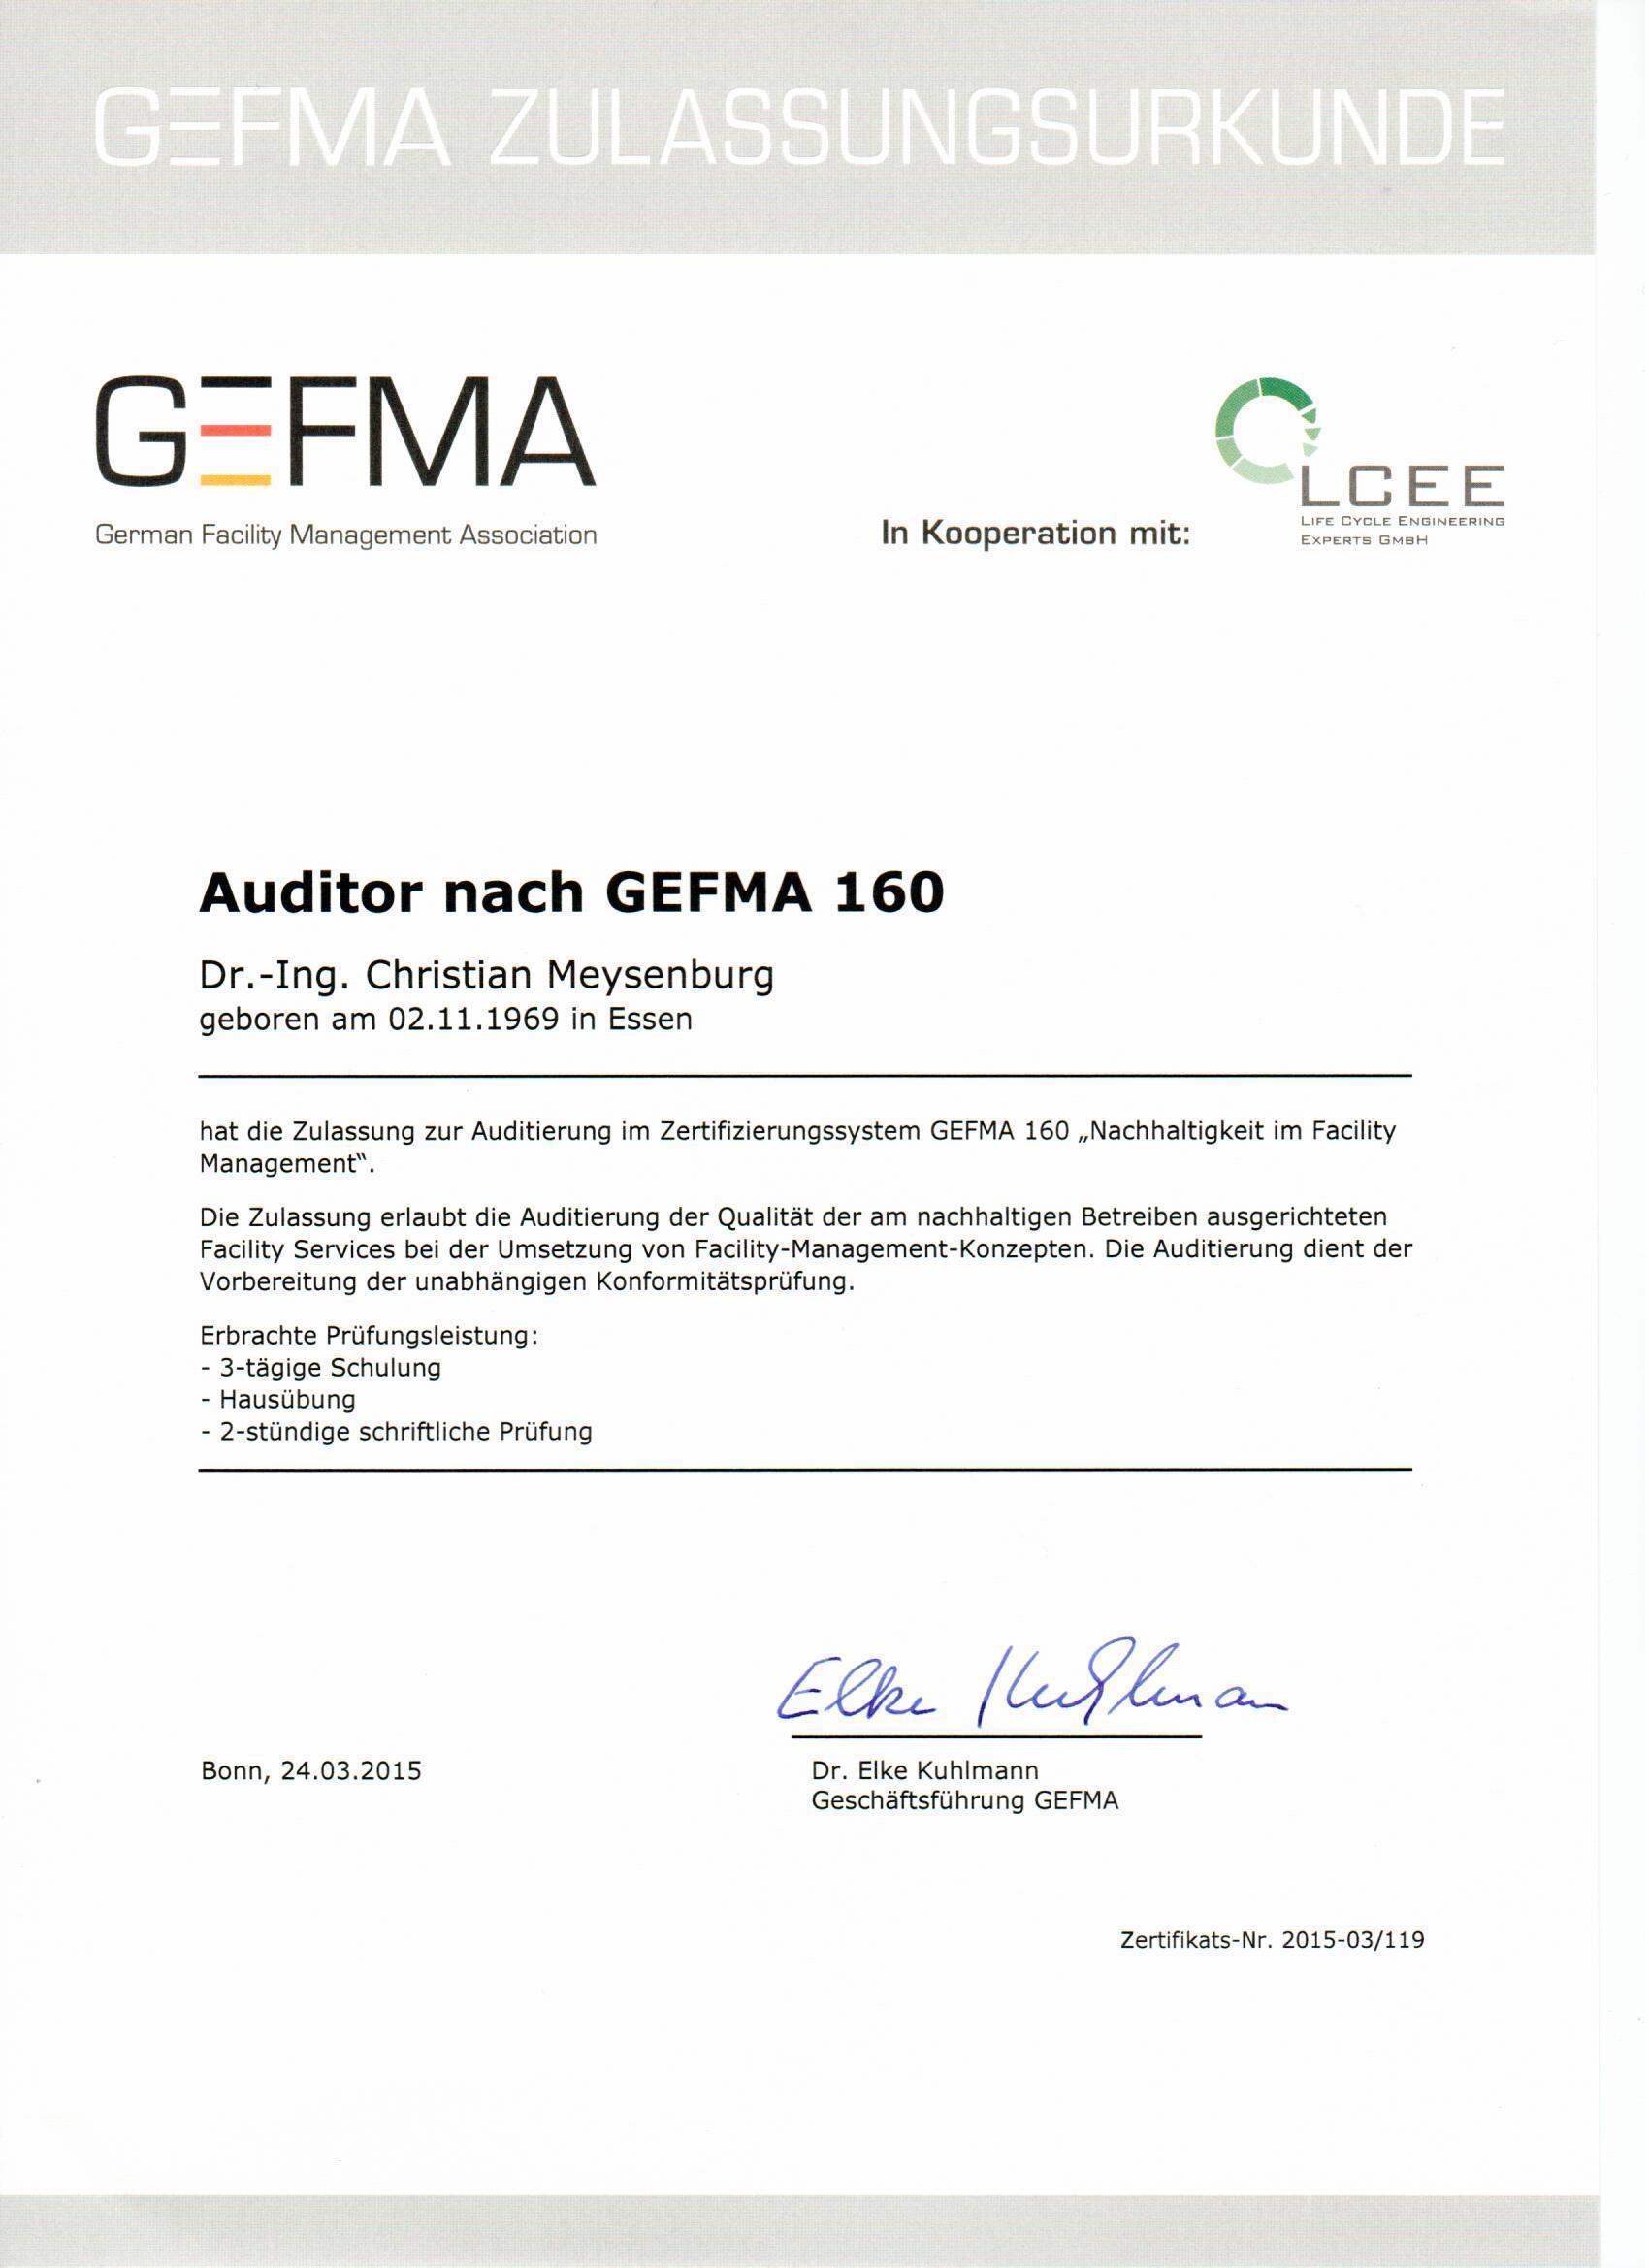 Auditorenurkunde GEFMA 160